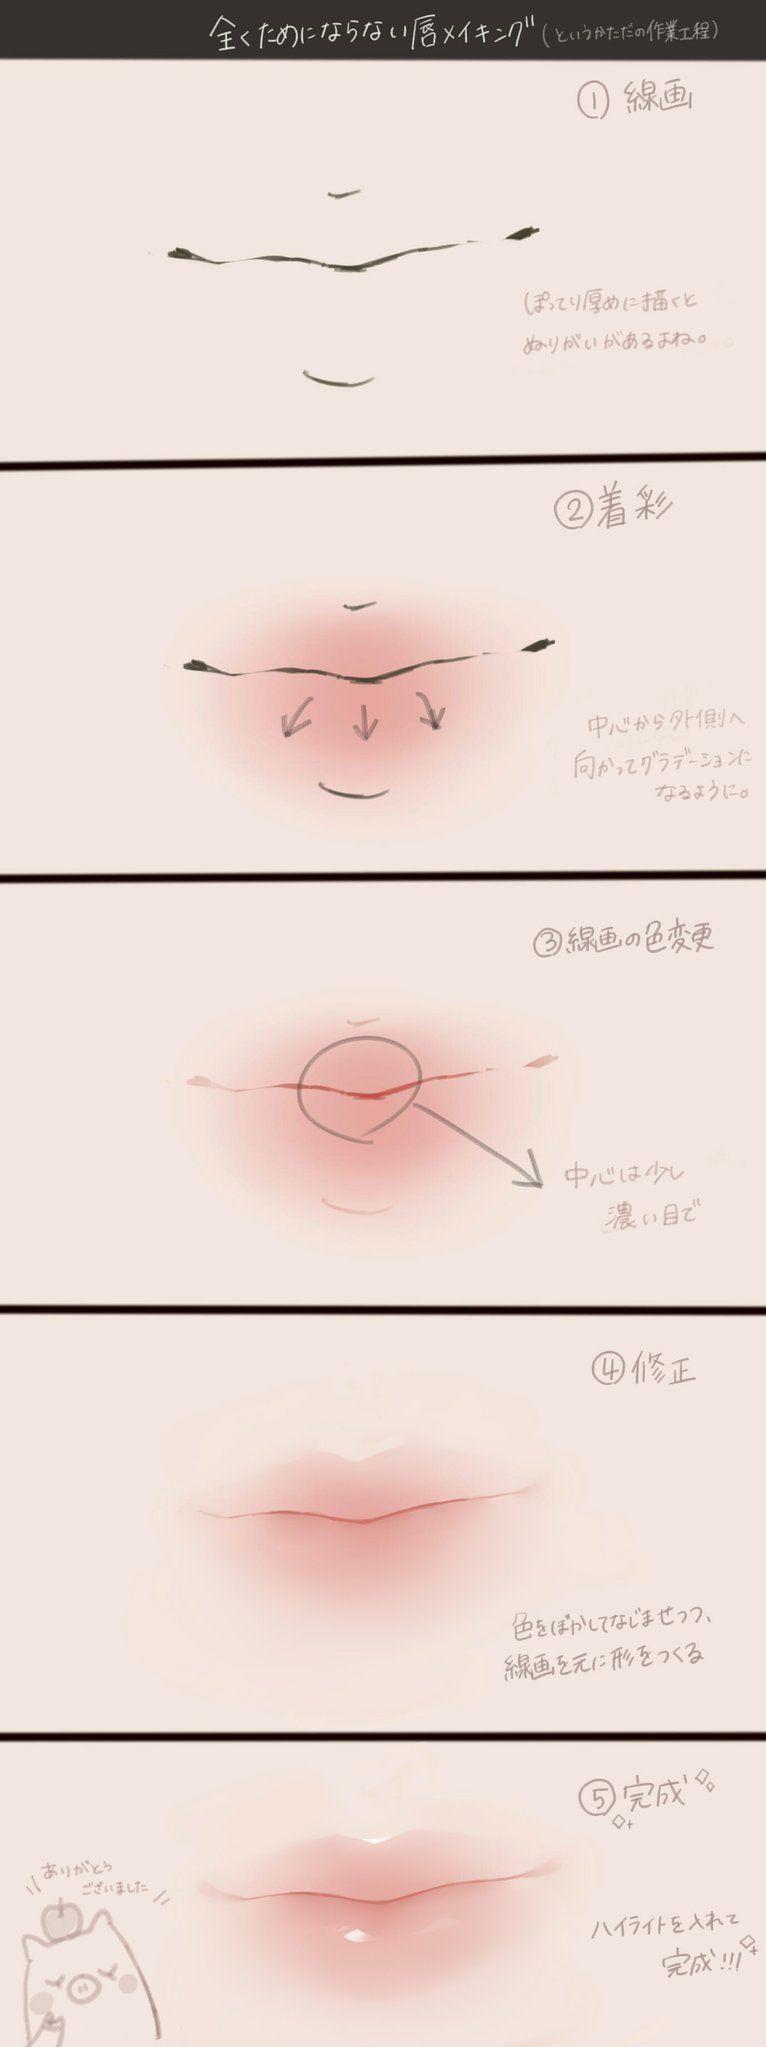 Photo of 雪白みくろ on Twitter